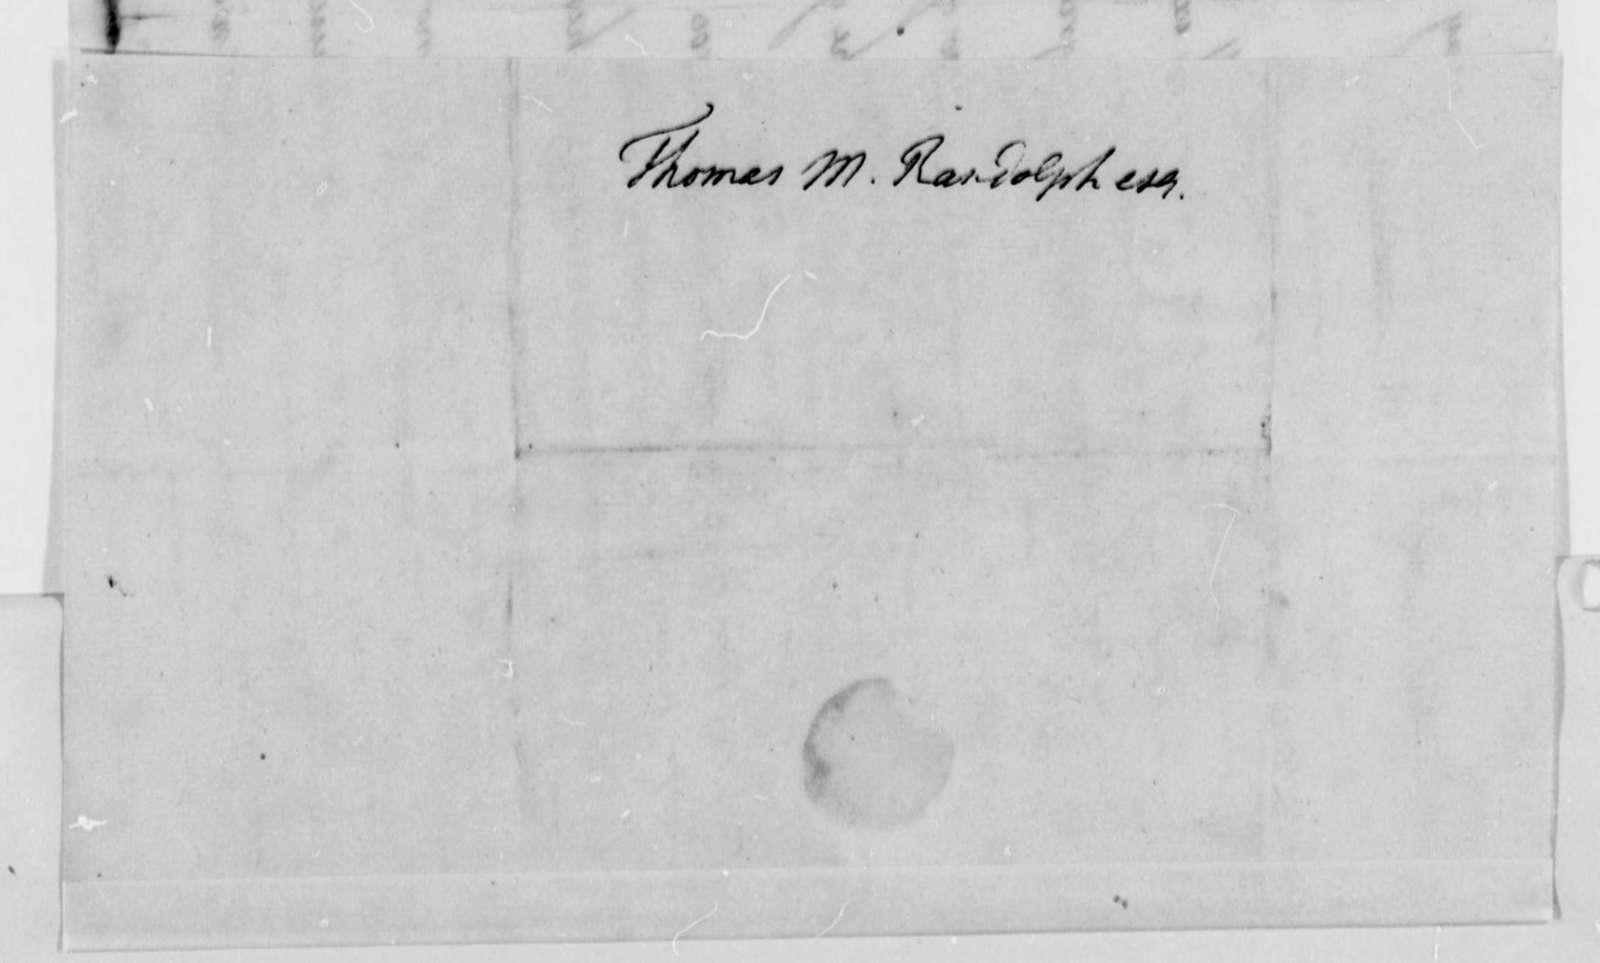 Mary Jefferson to Thomas Mann Randolph, May 13, 1792